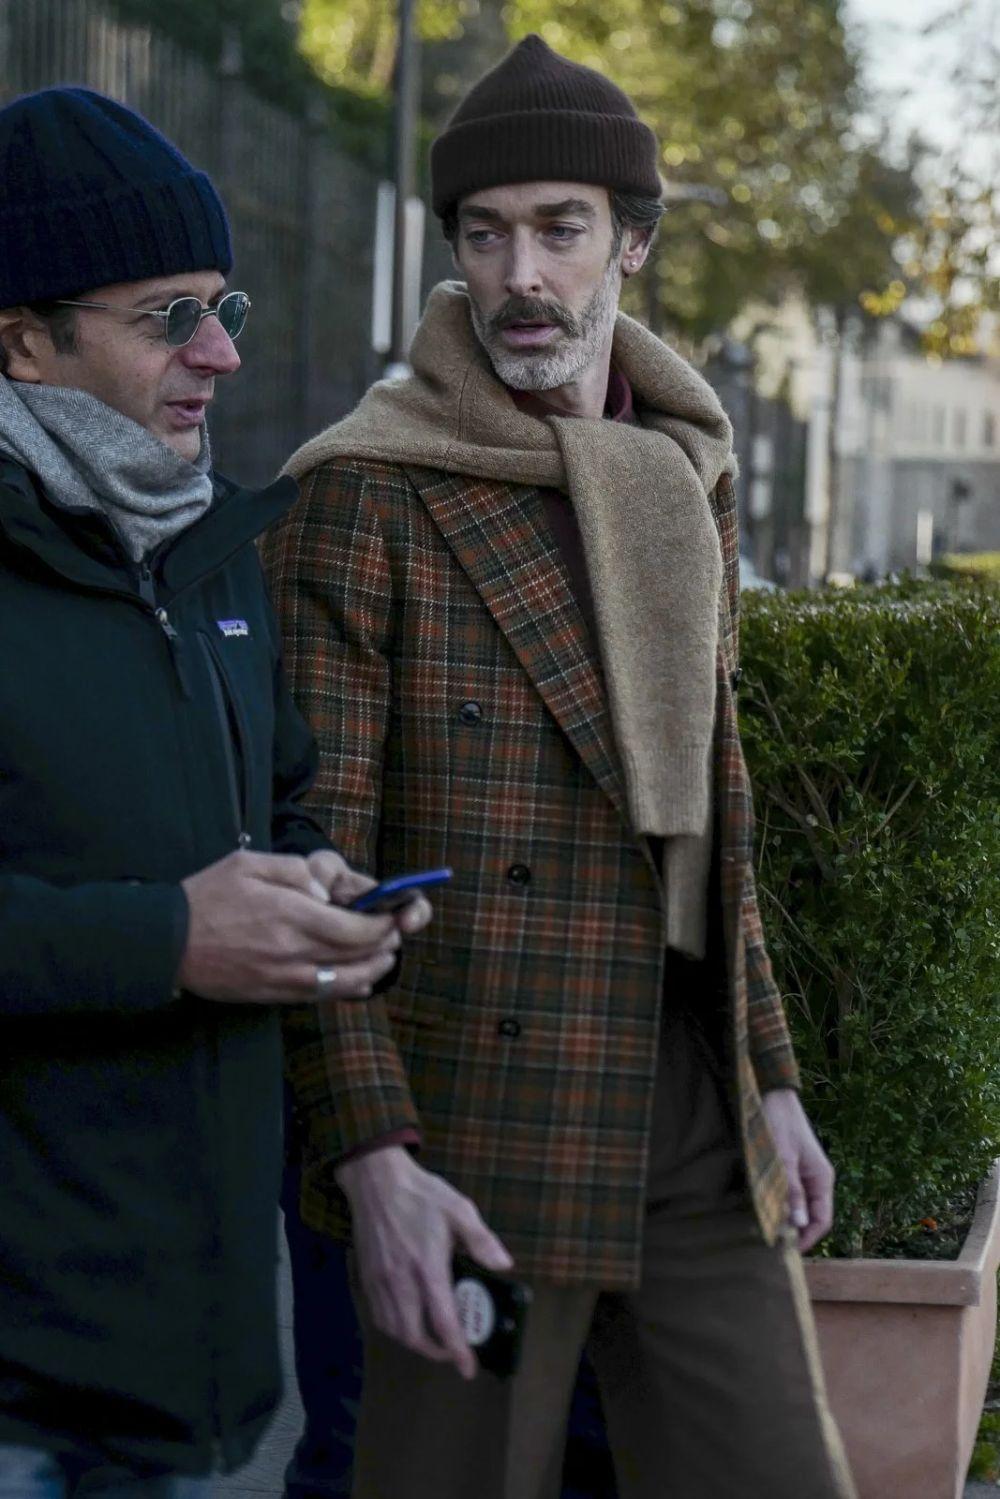 Pitti Uomo: the Best Street Style | GQ